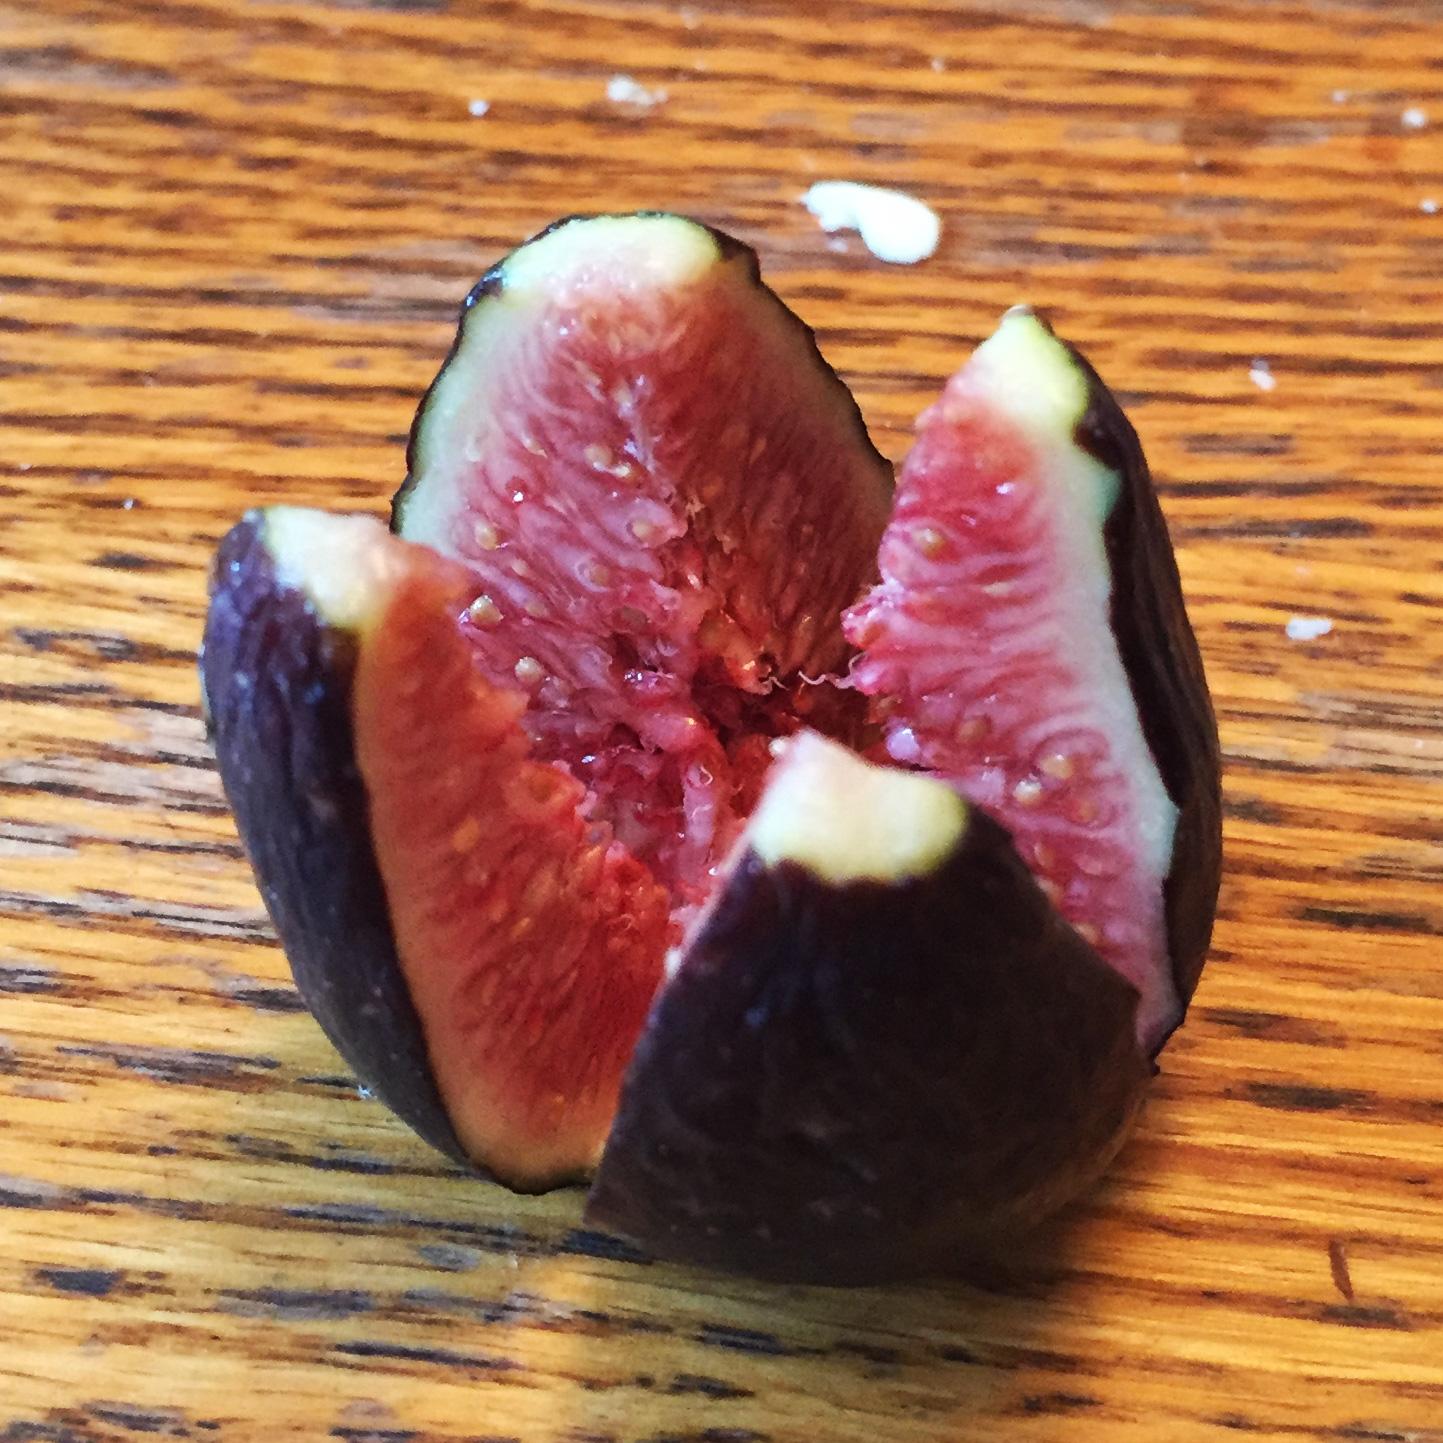 Stuffed-figs-recipe-boursin-goat-cheese-walnuts-appetizers-holiday-season-party-recipes-fig-cut.jpg